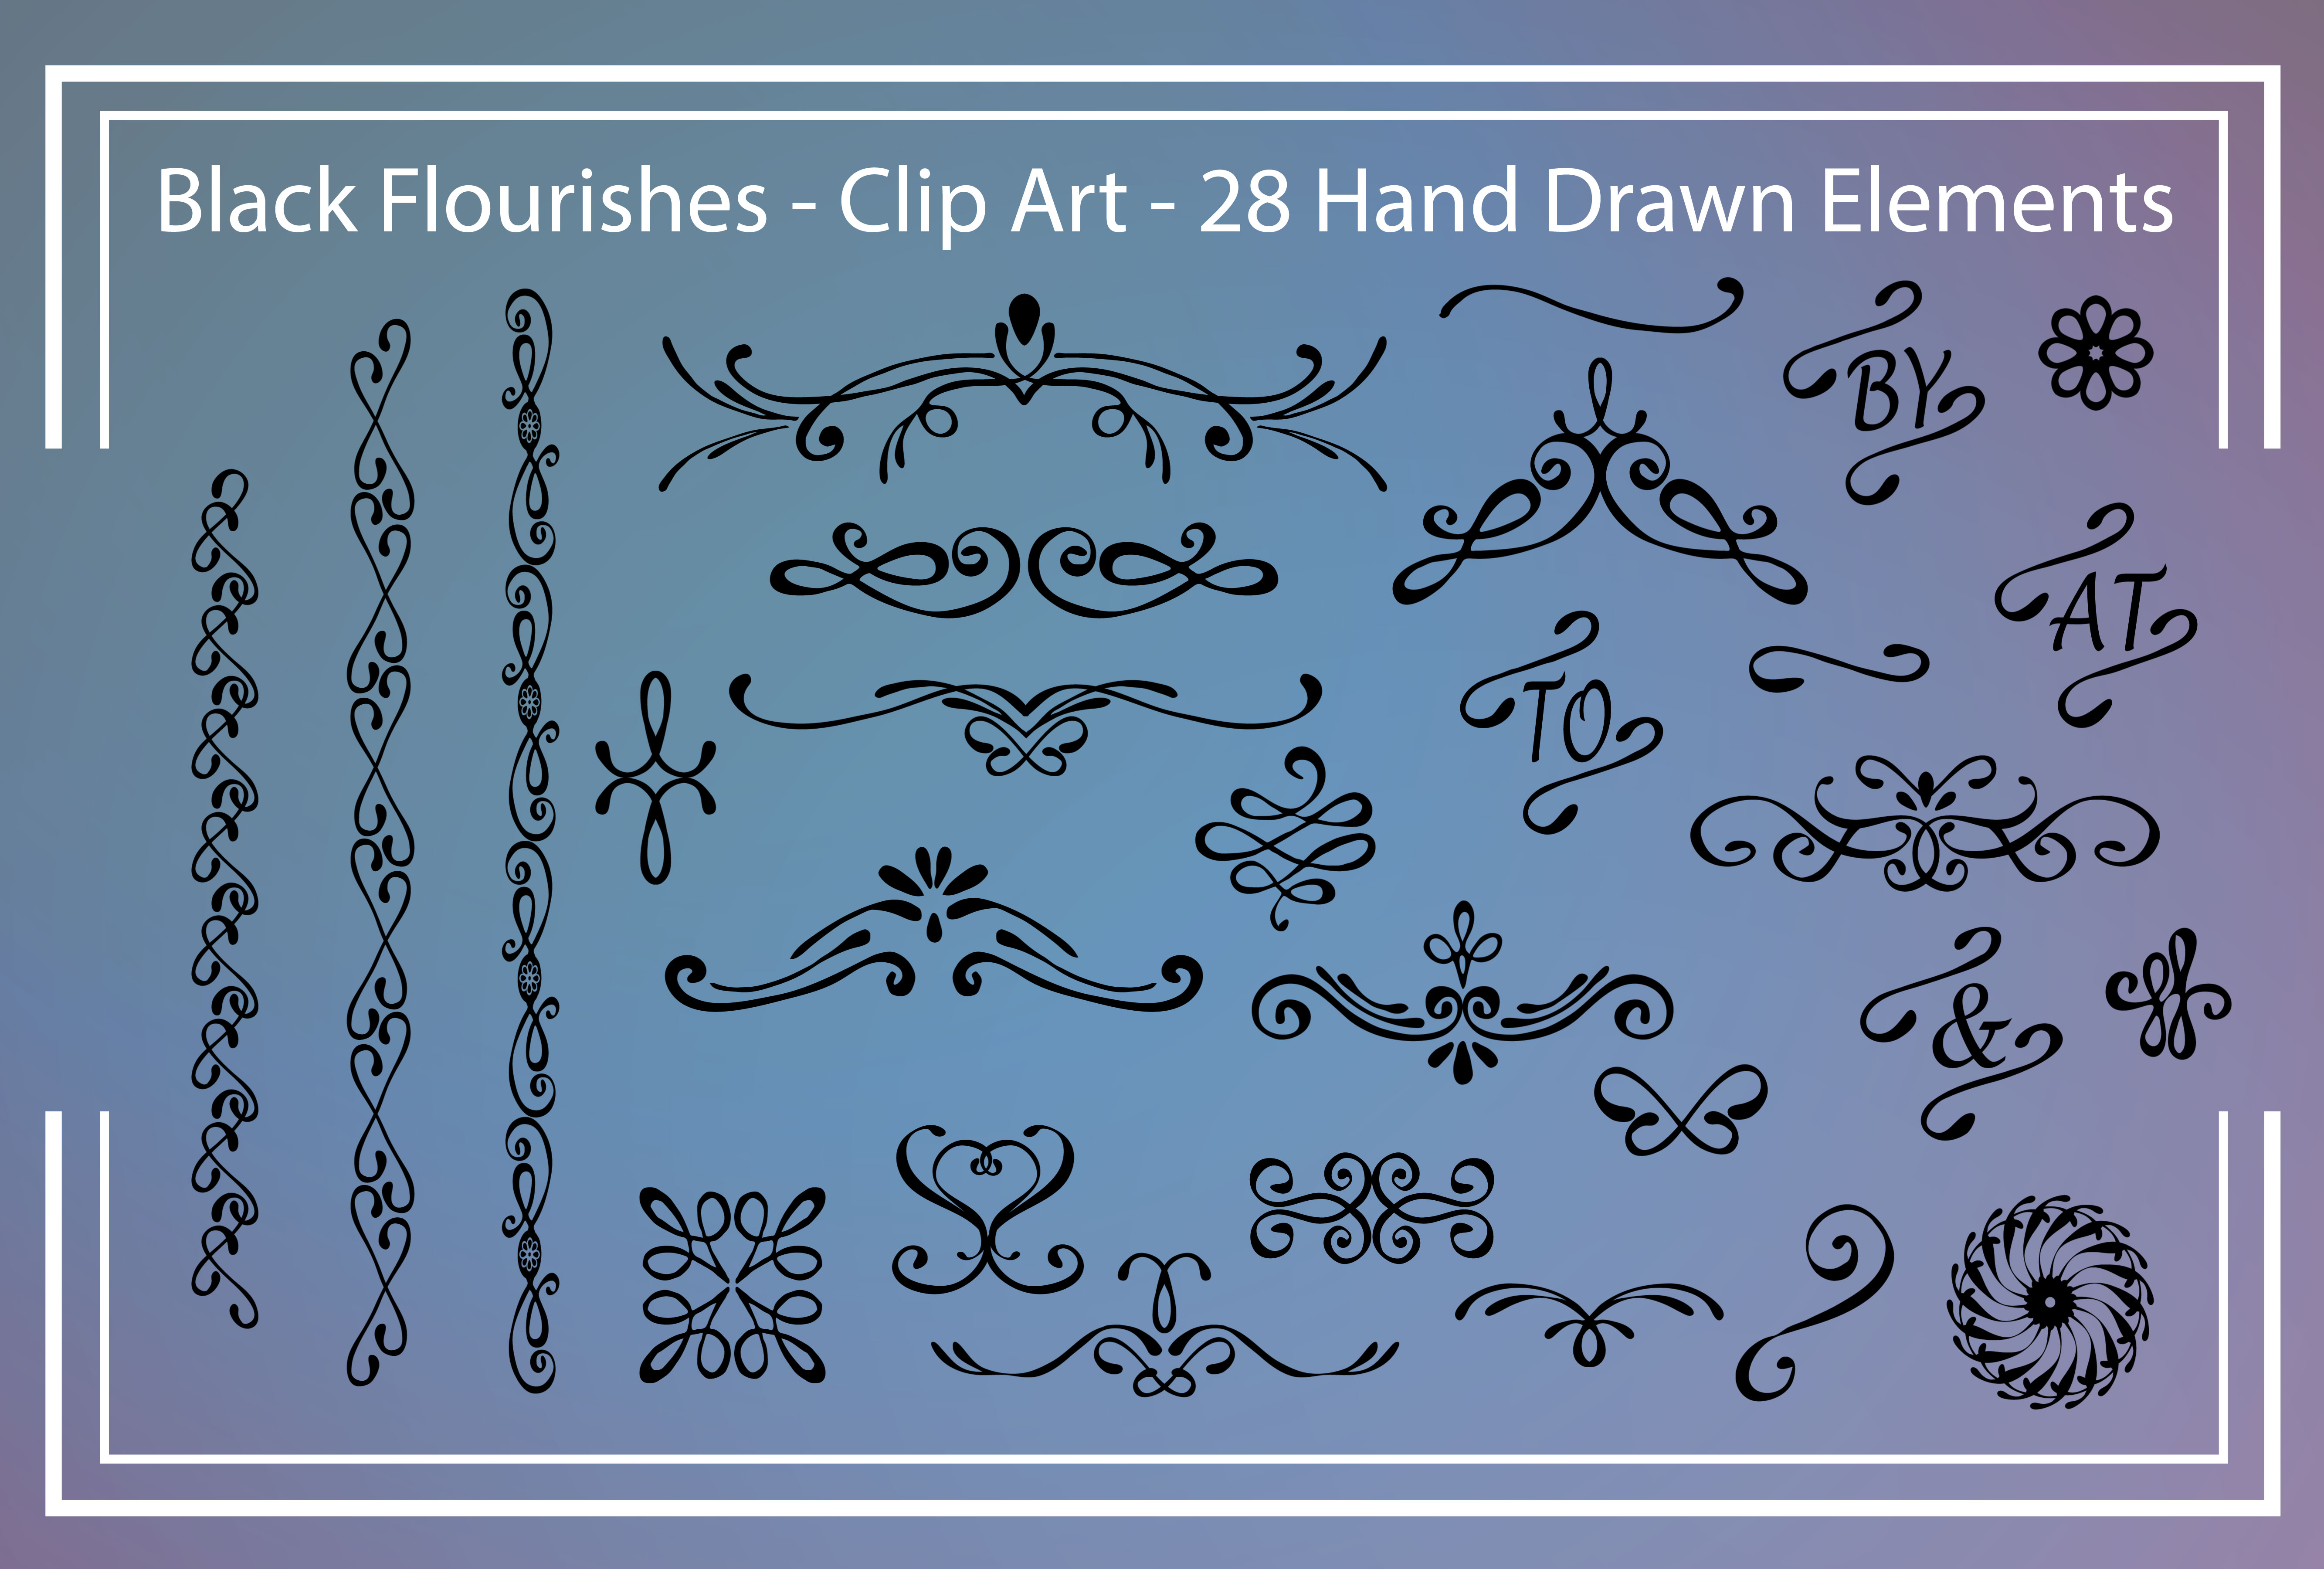 Black Flourishes - Clipart example image 1